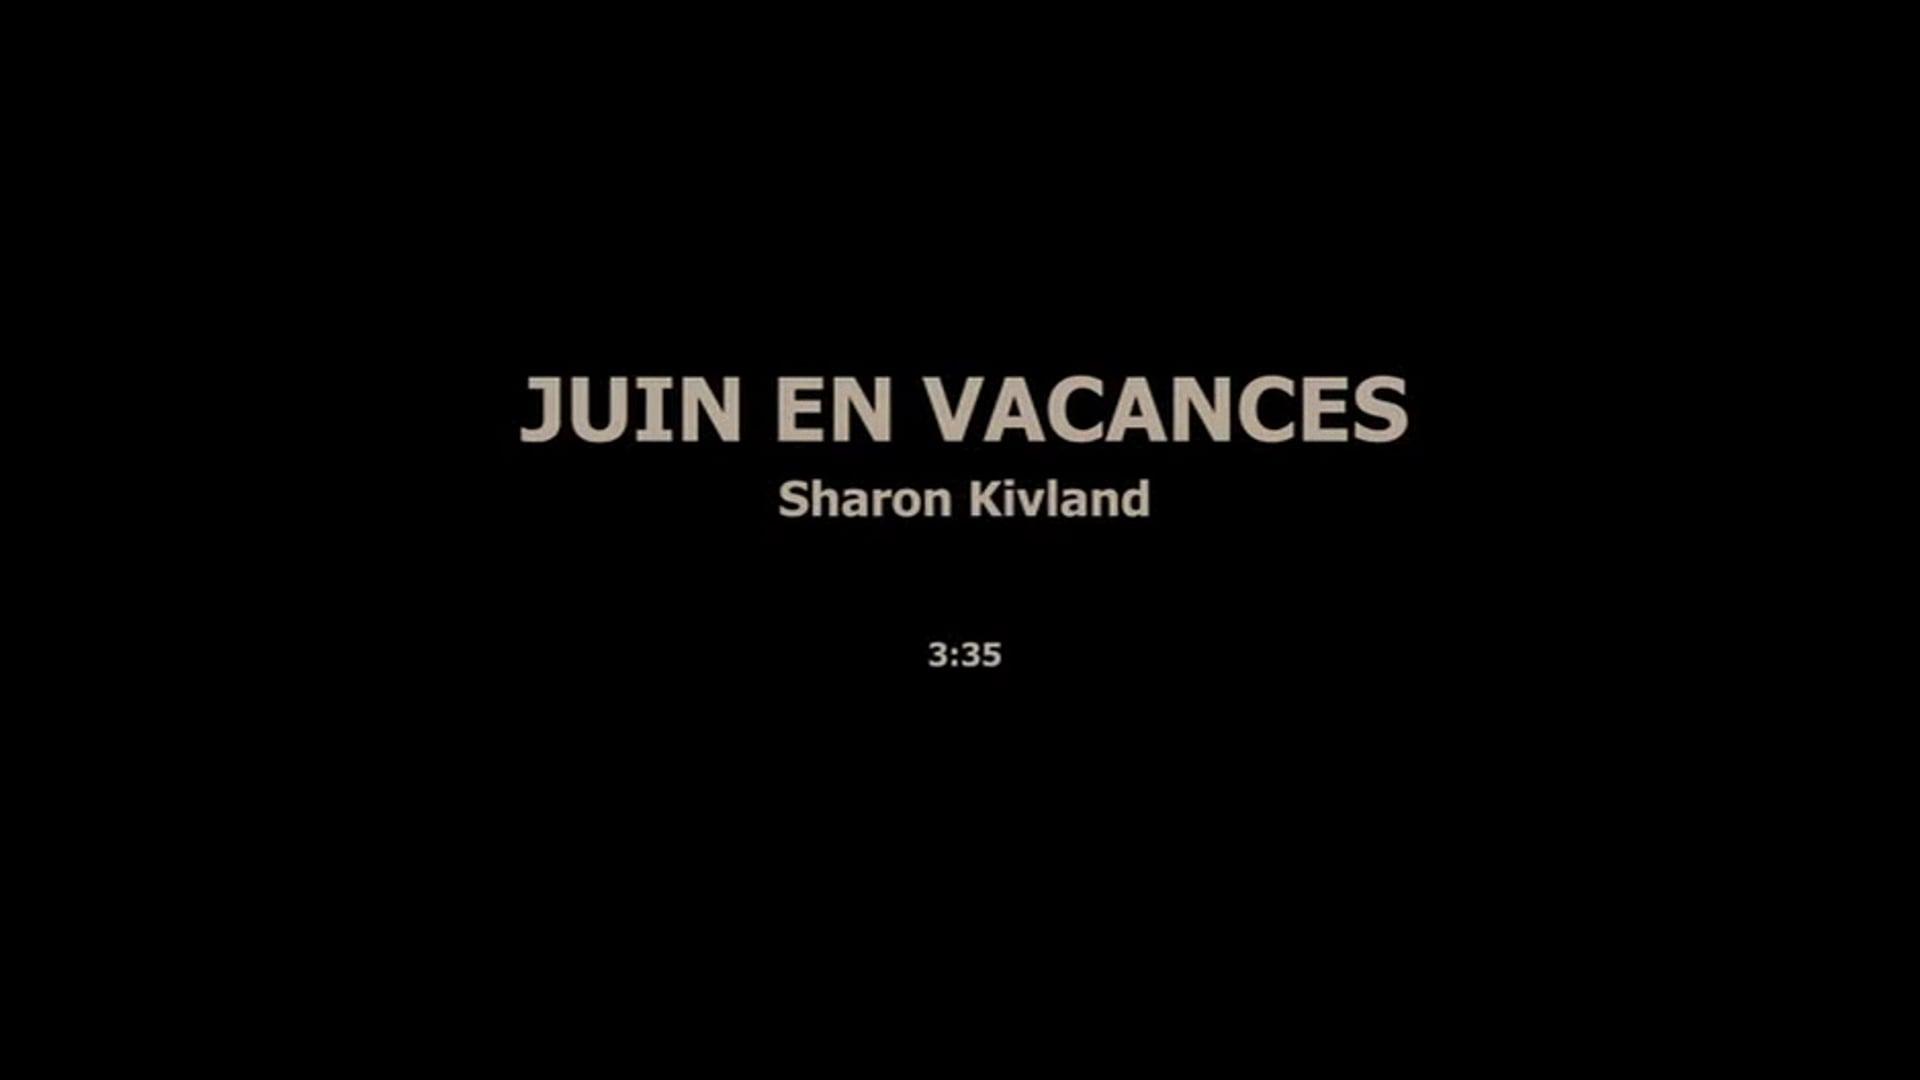 JUIN EN VACANCES - SHARON KIVLAND